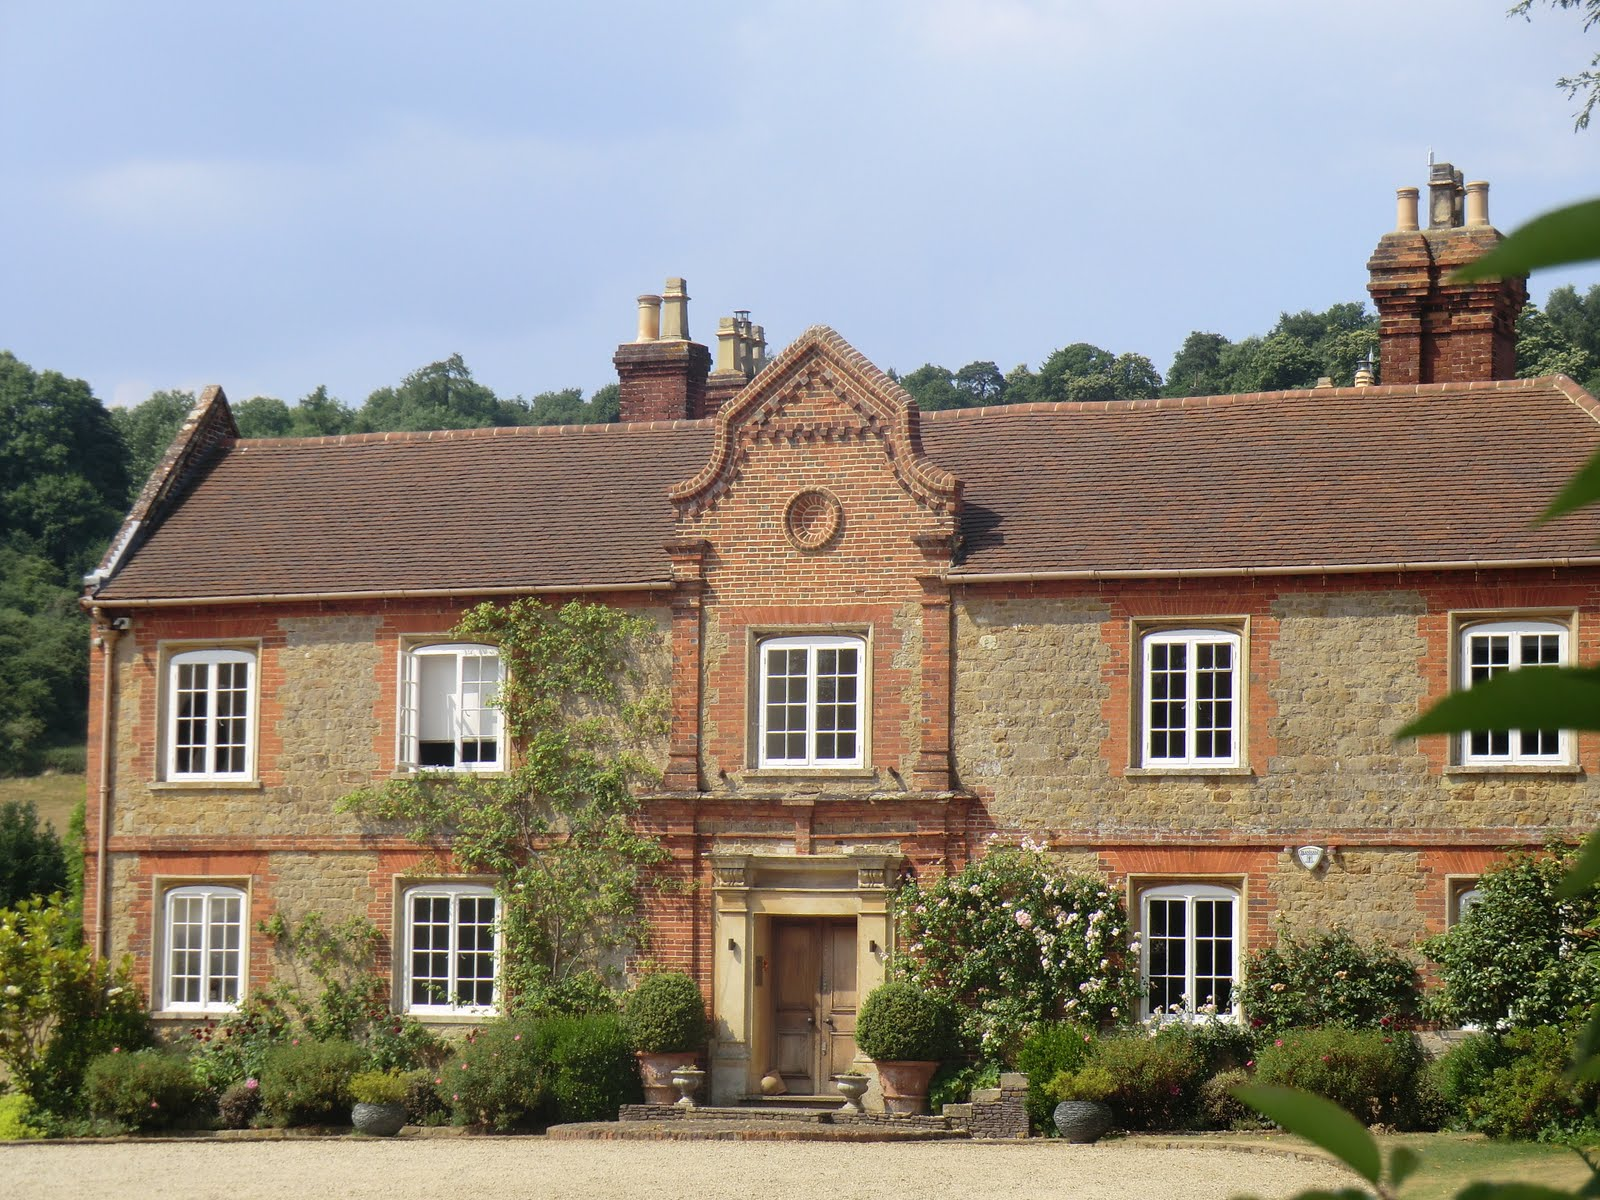 CIMG8132 Chilworth Manor